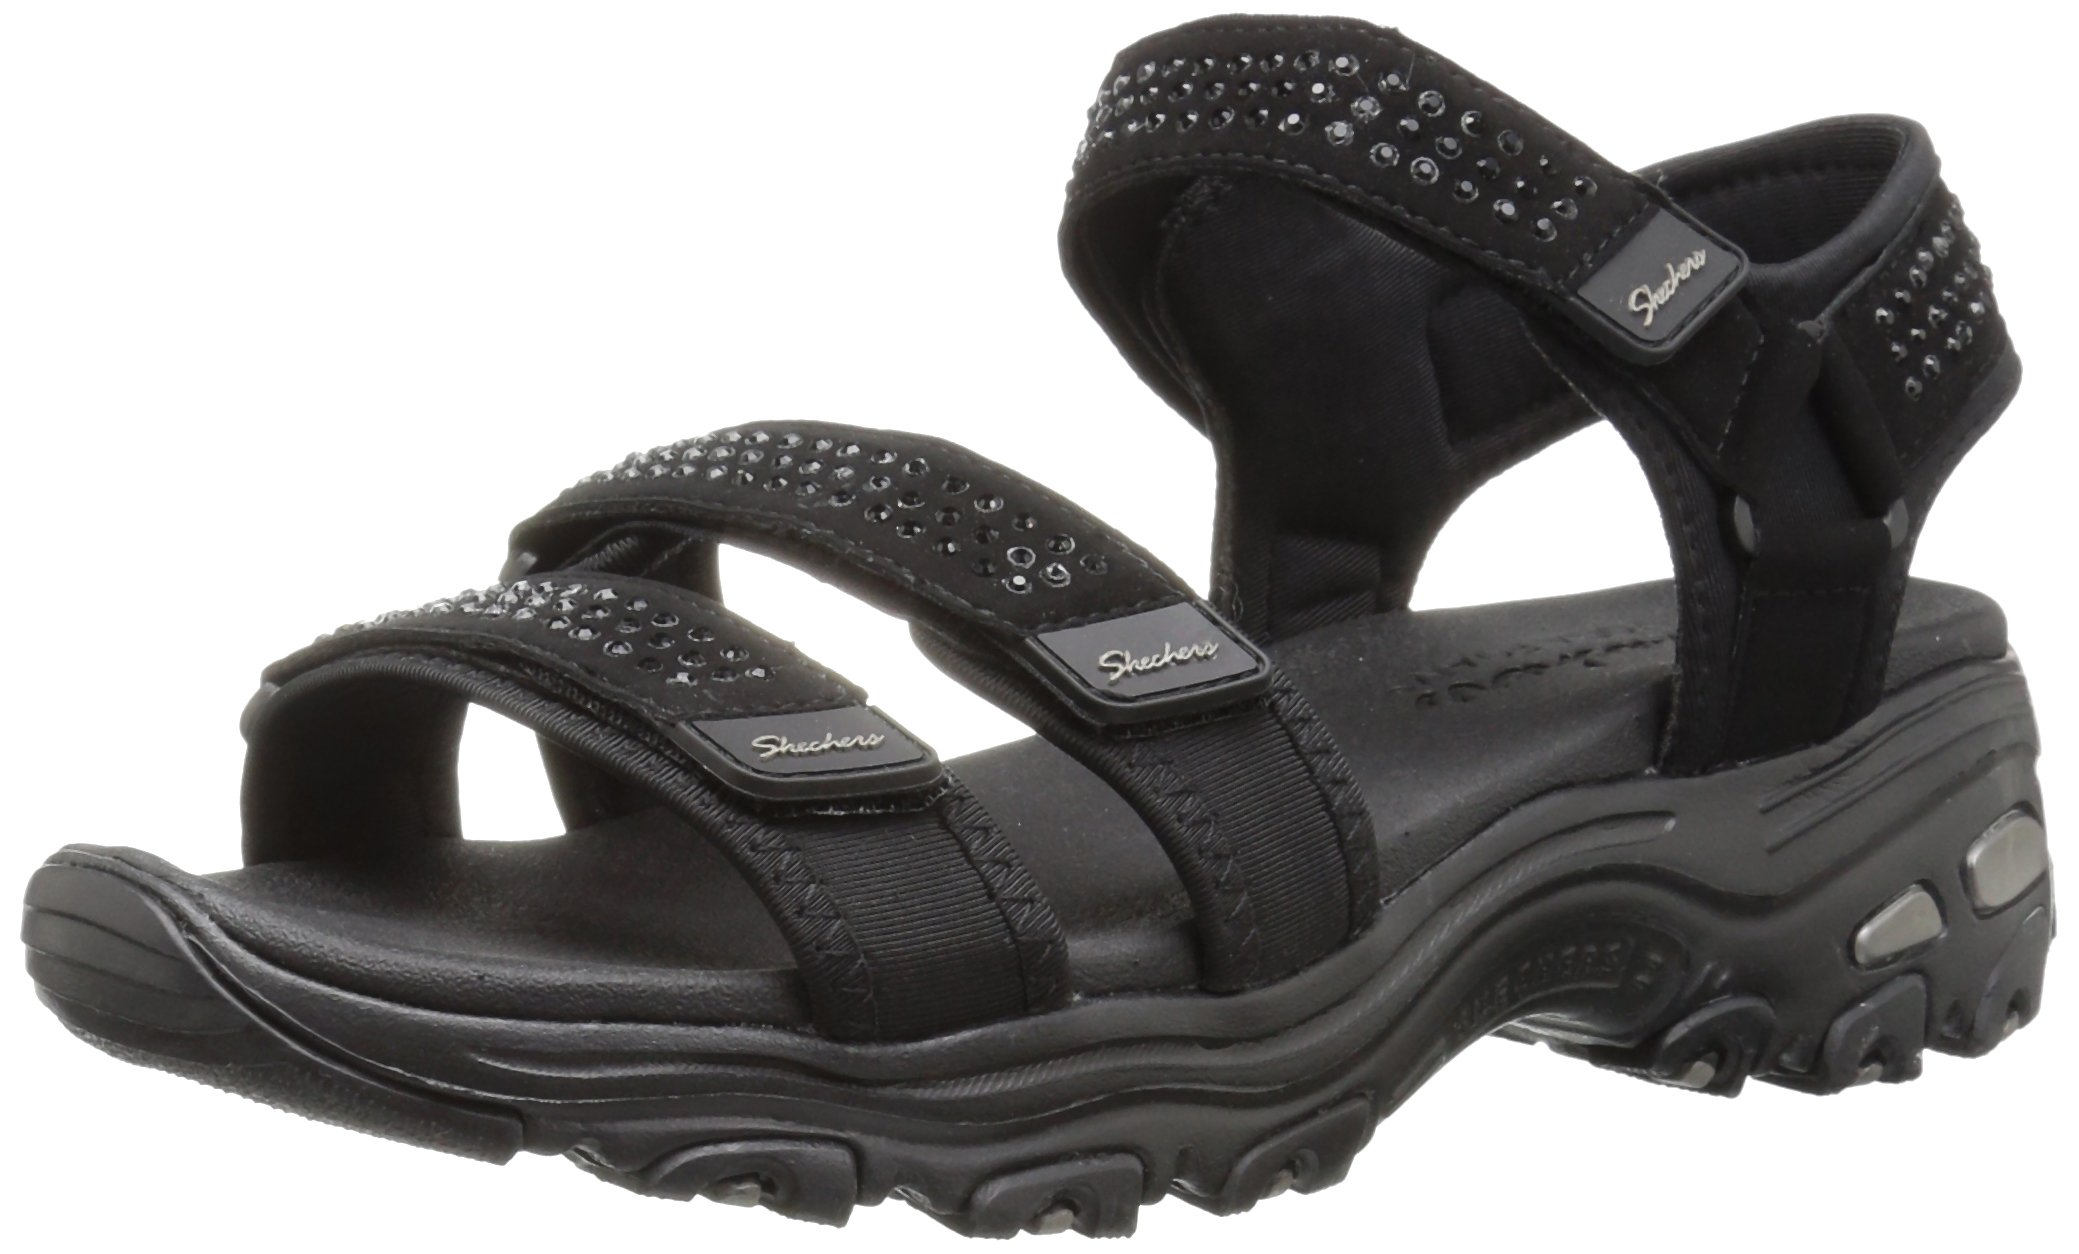 Skechers Women's D'Lites-Retro Glam-Rhinestone River Style Sporty Comfort Sport Sandal, Black/Black, 8 M US